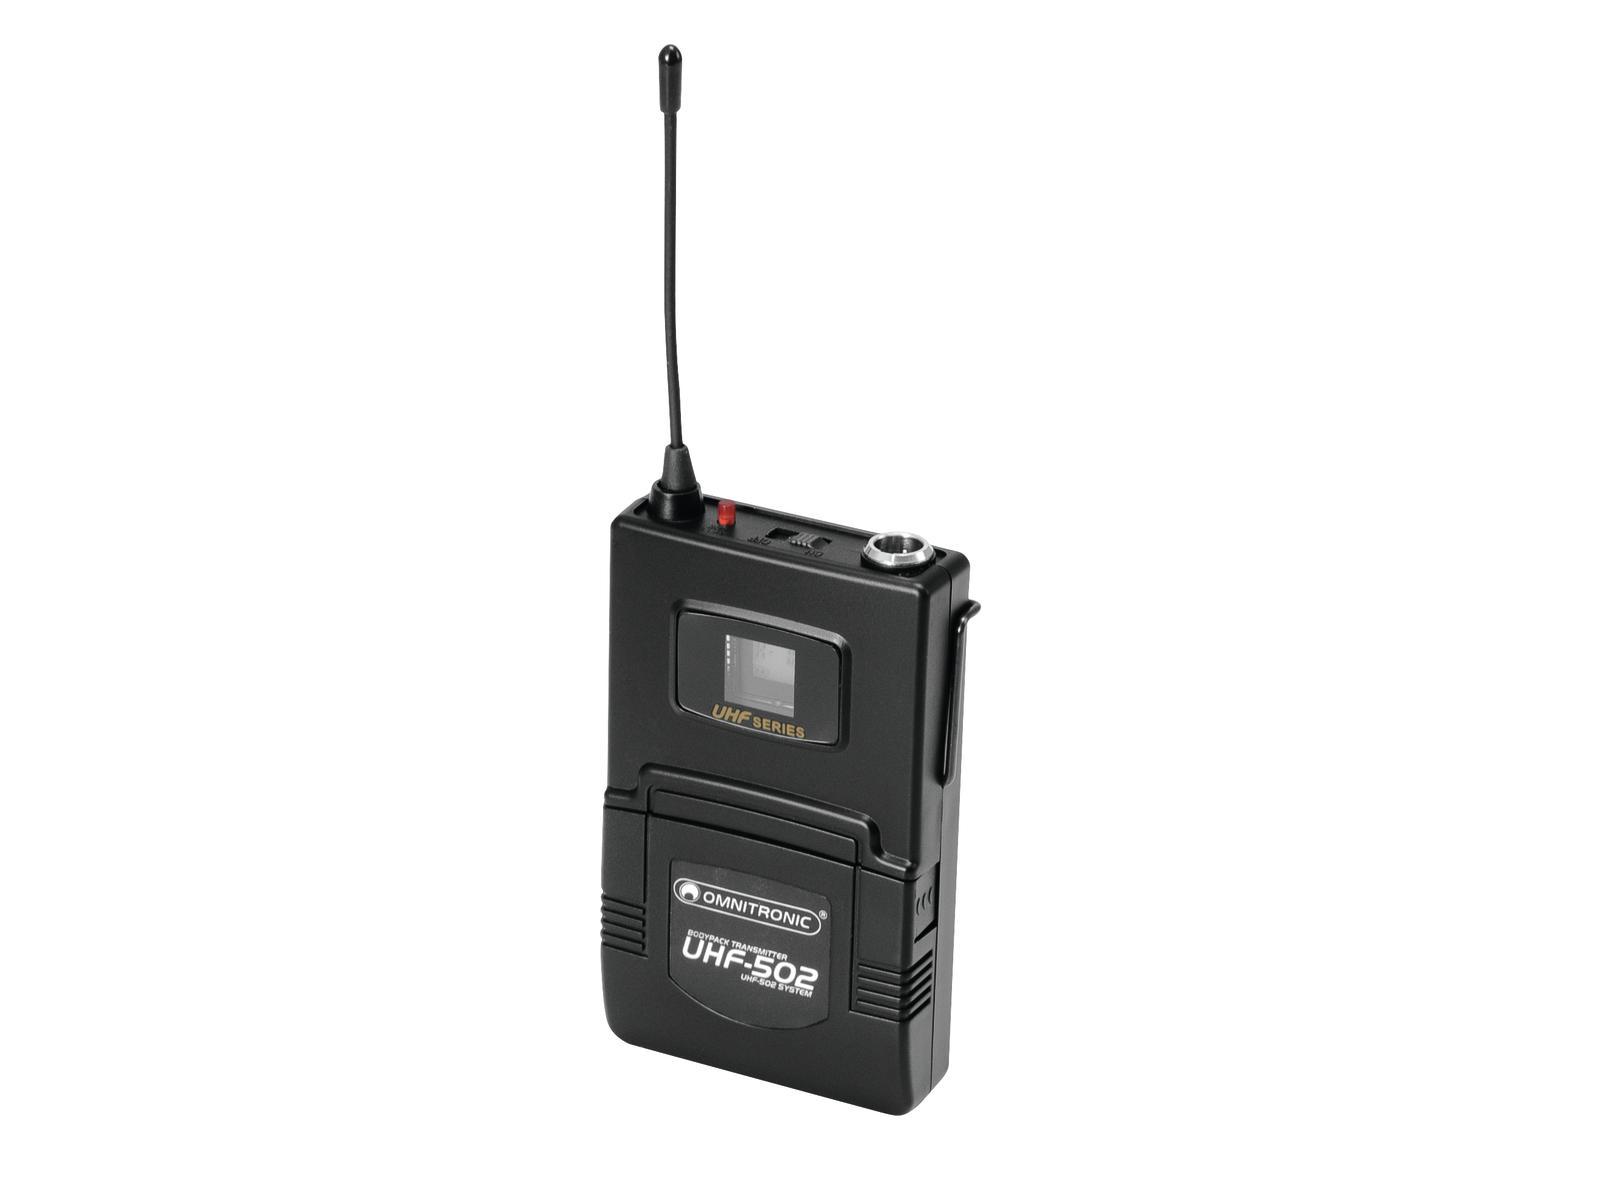 Omnitronic UHF-502 Bodypack incl. lavalier (CH B orange)